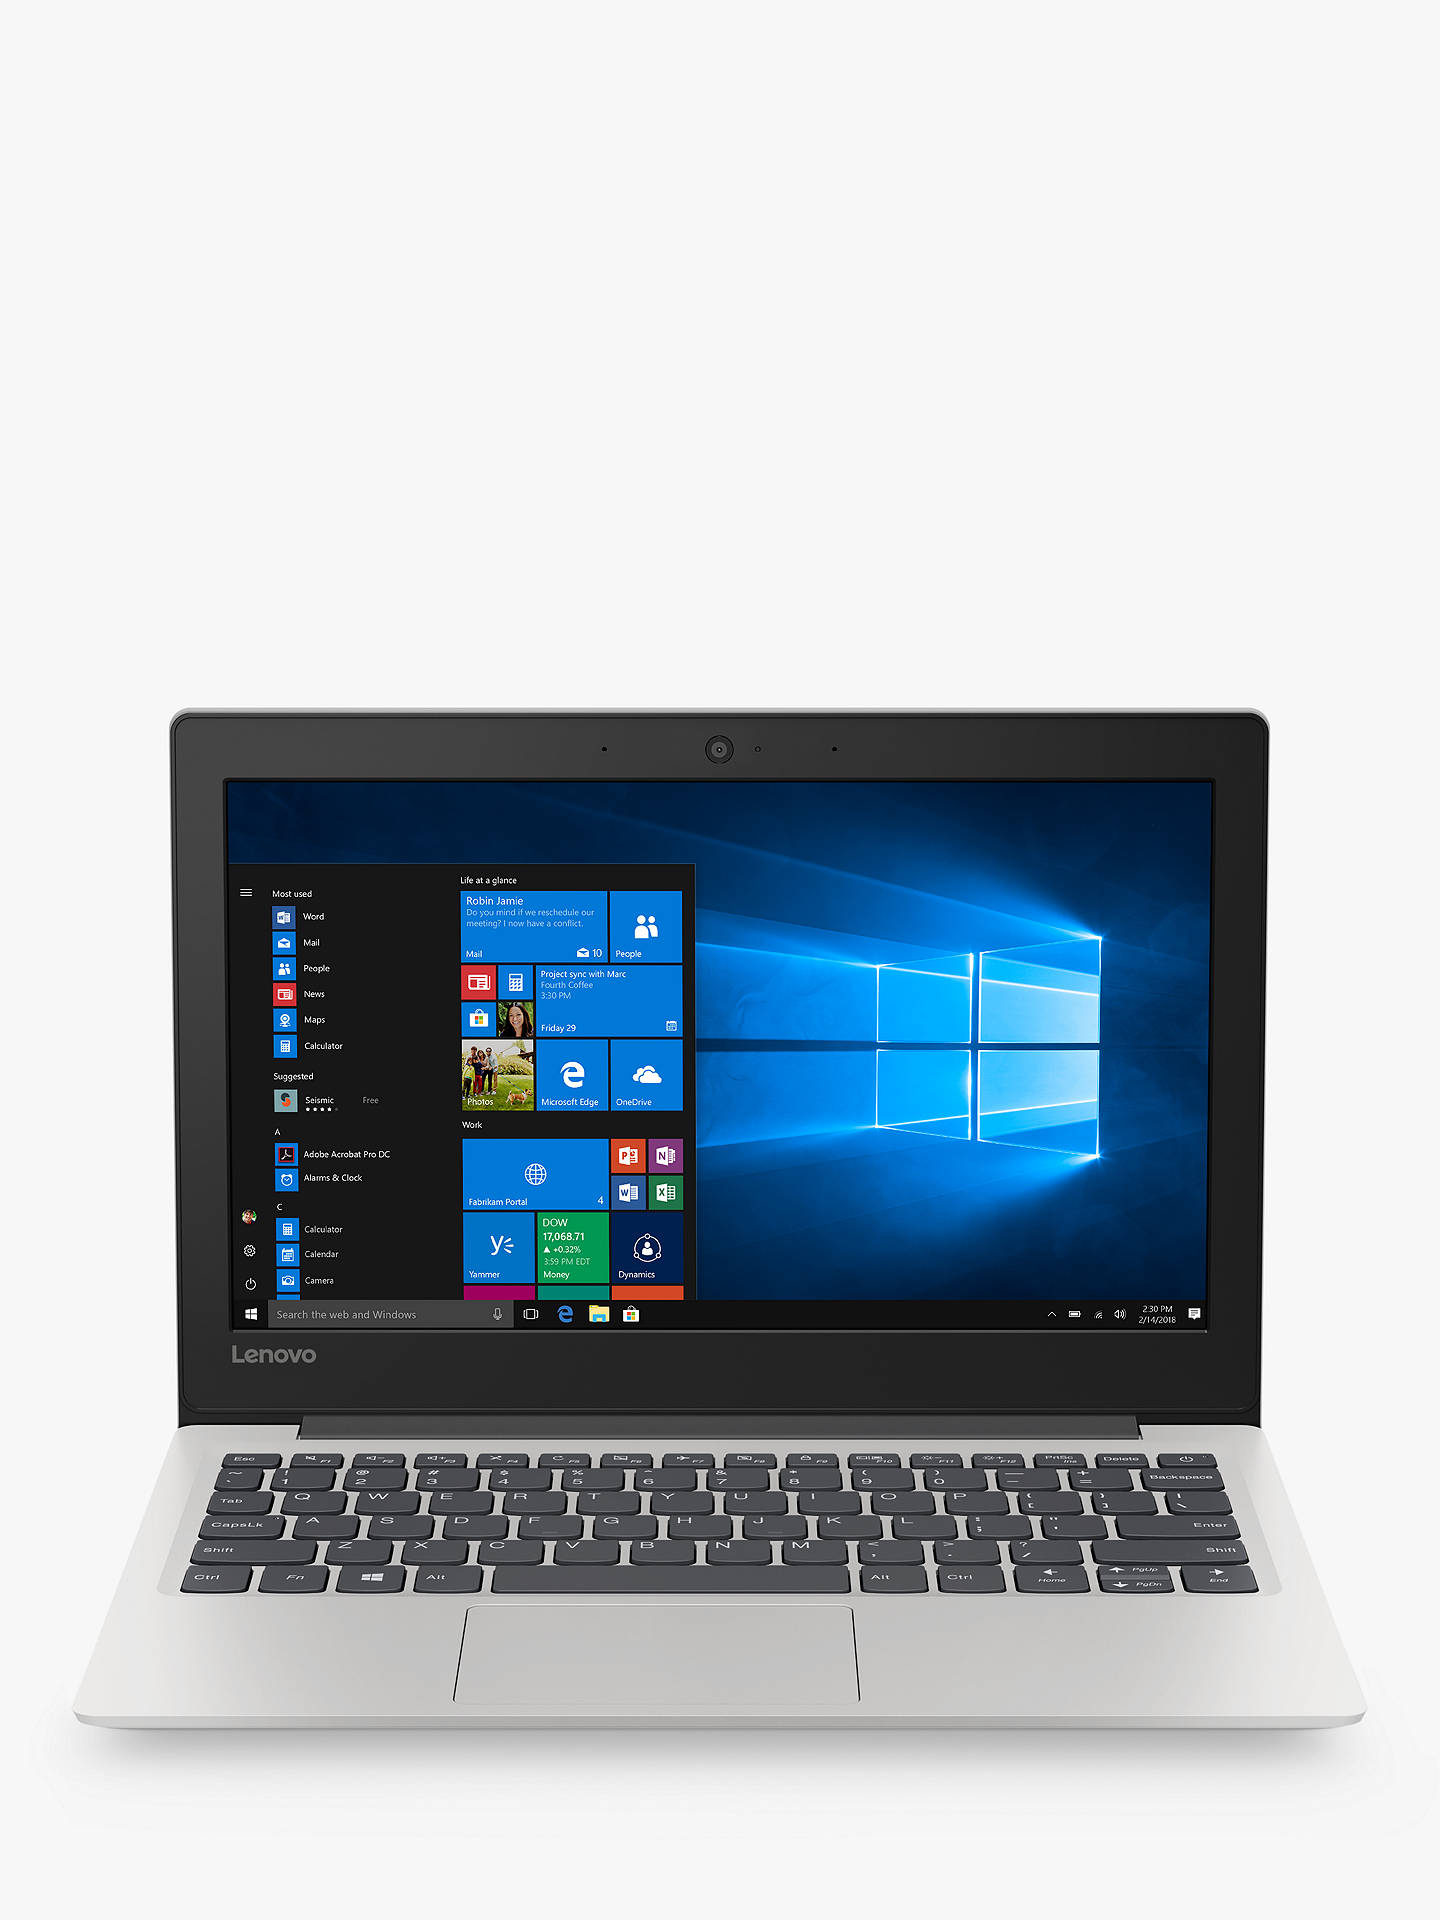 Lenovo IdeaPad S130-11IGM Laptop, Intel Celeron N4000 Processor, 4GB RAM,  64GB eMMC, 11 6